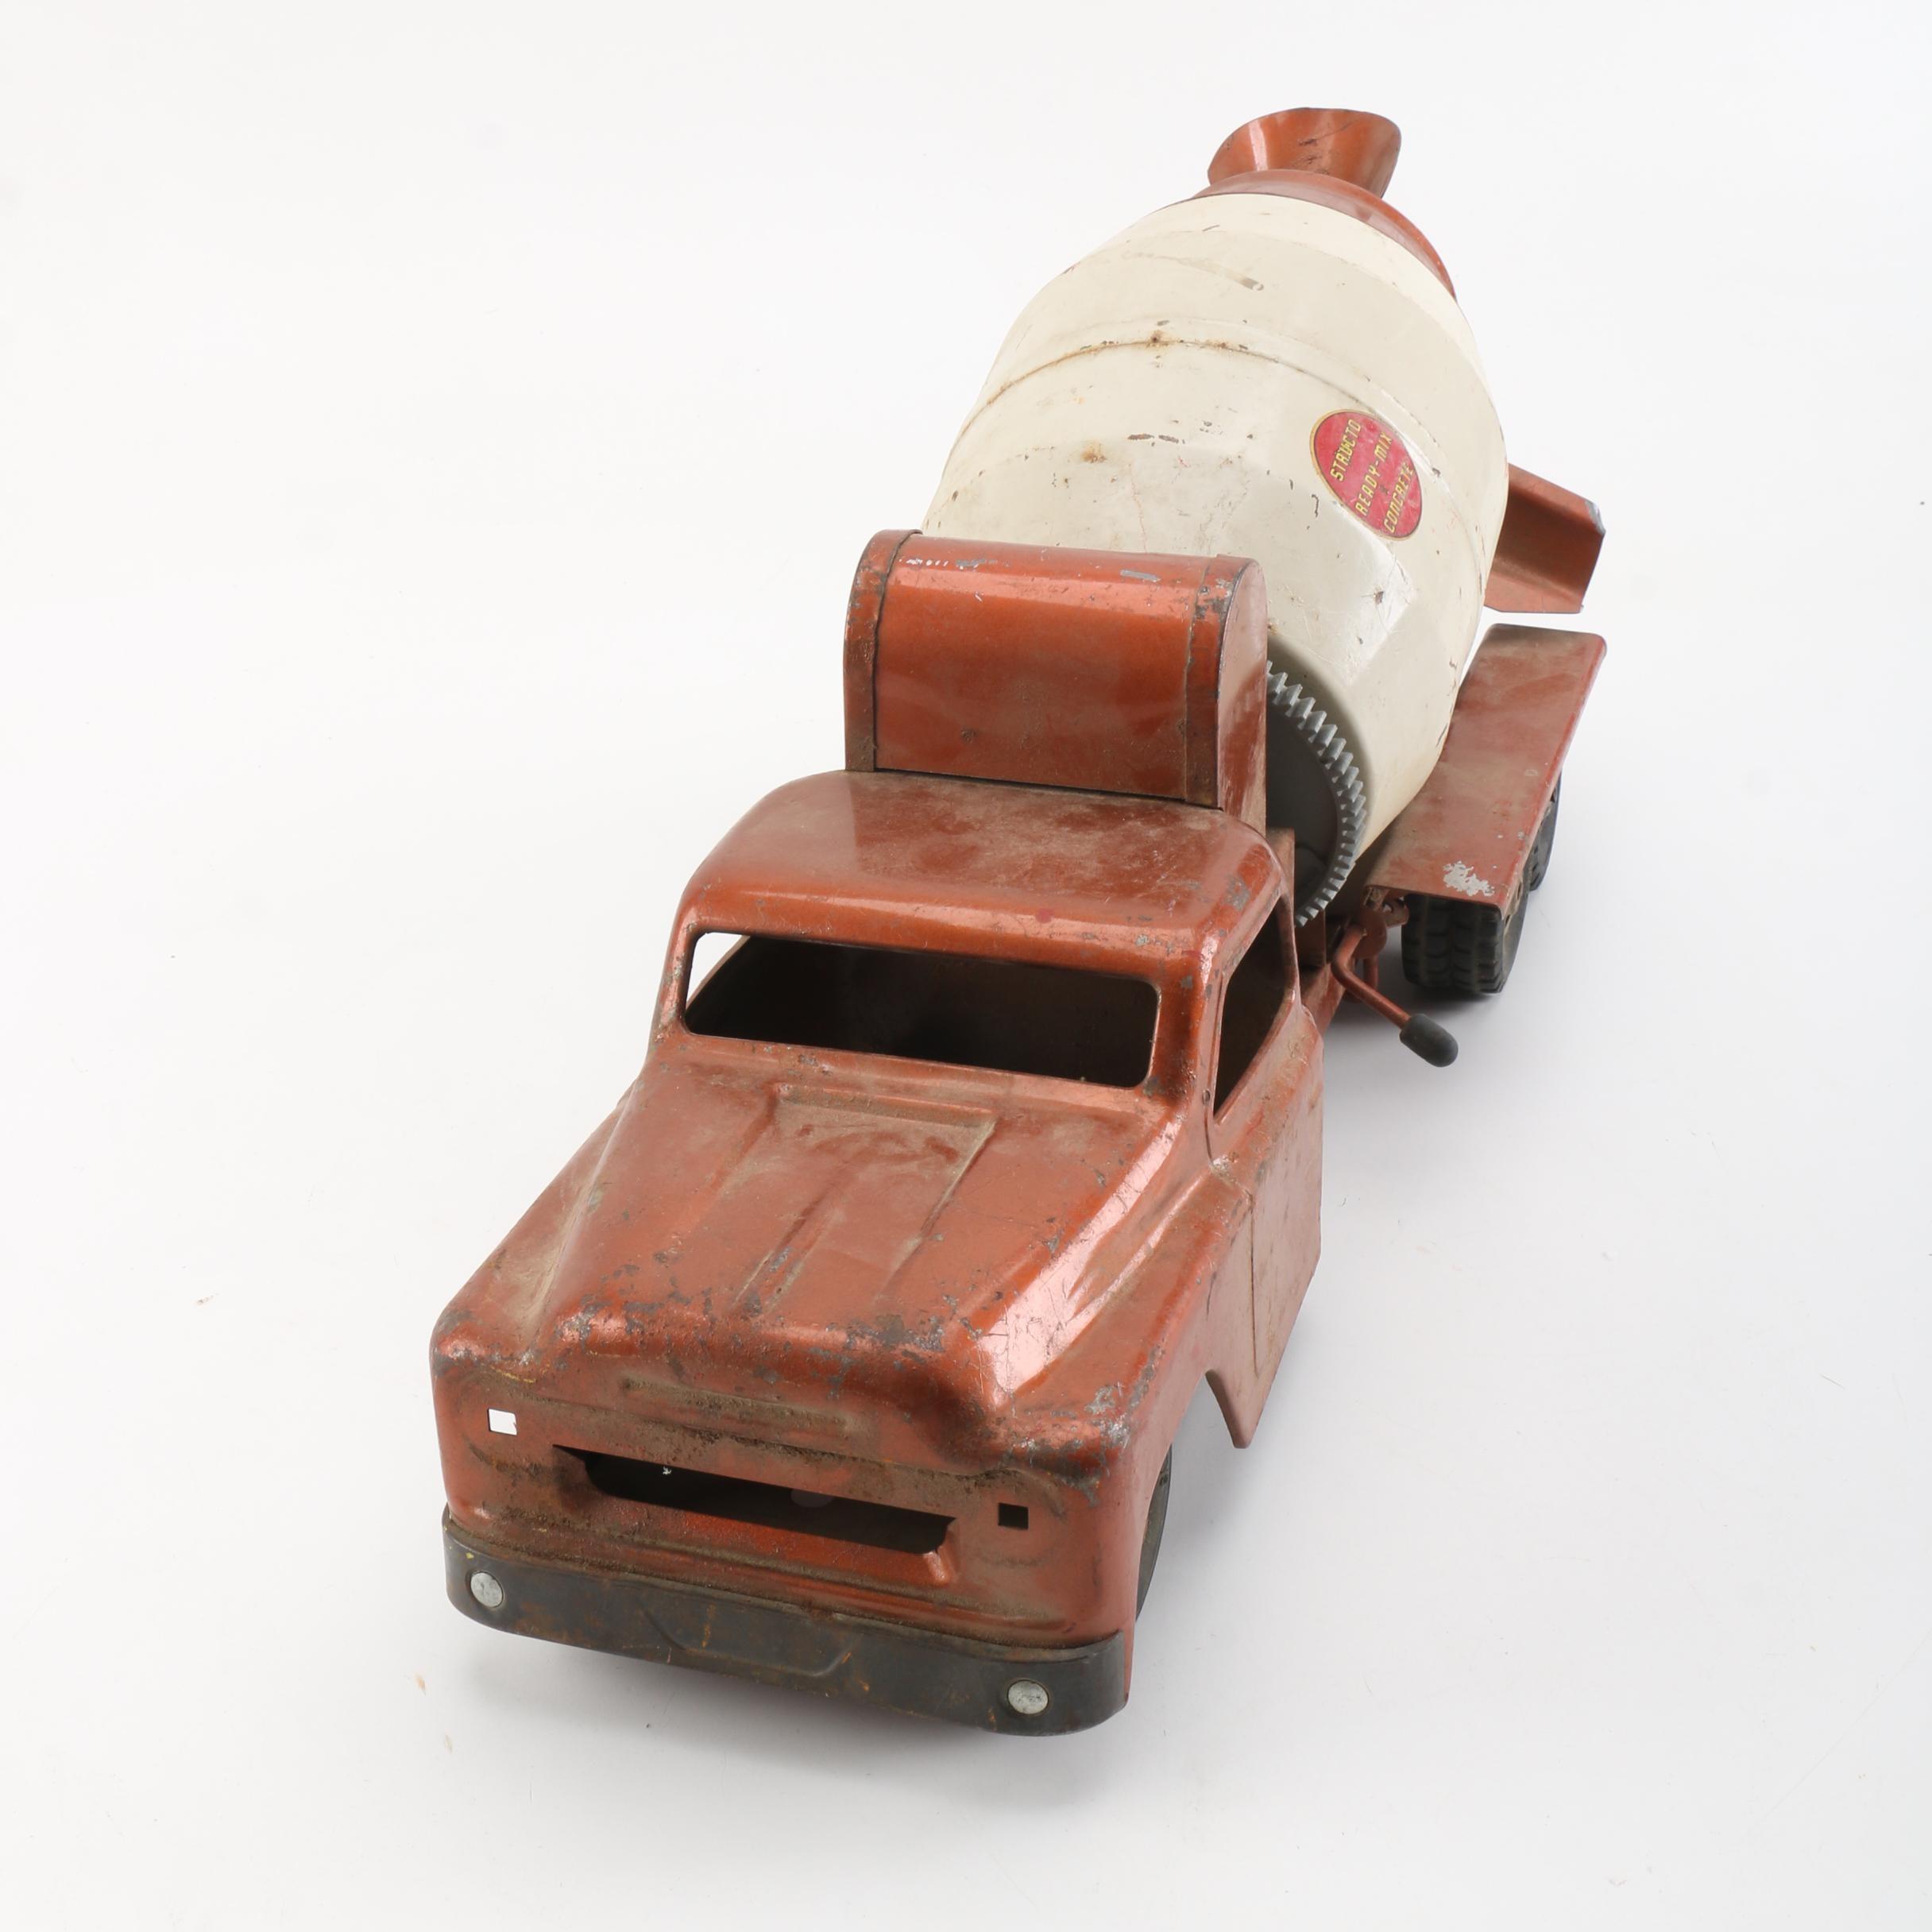 1950s Structo Pressed Steel Ready-Mix Concrete Truck